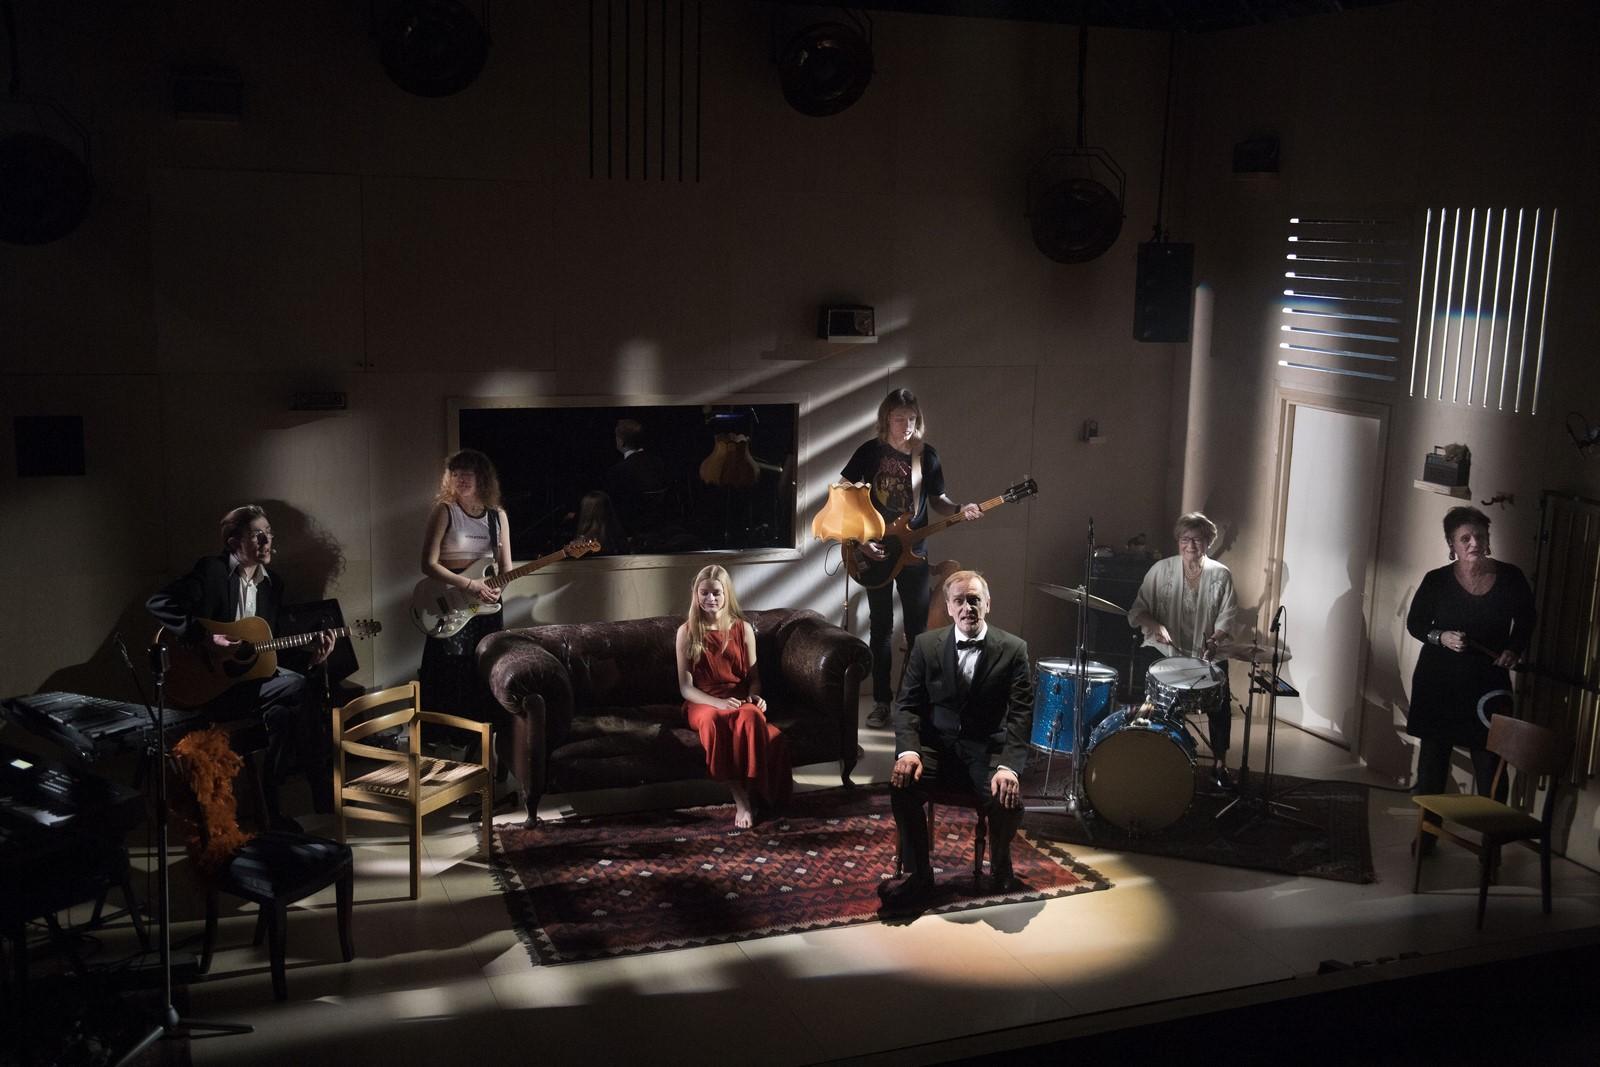 Anmeldelse: Spotify og Radio Luxembourg, Aalborg Teater